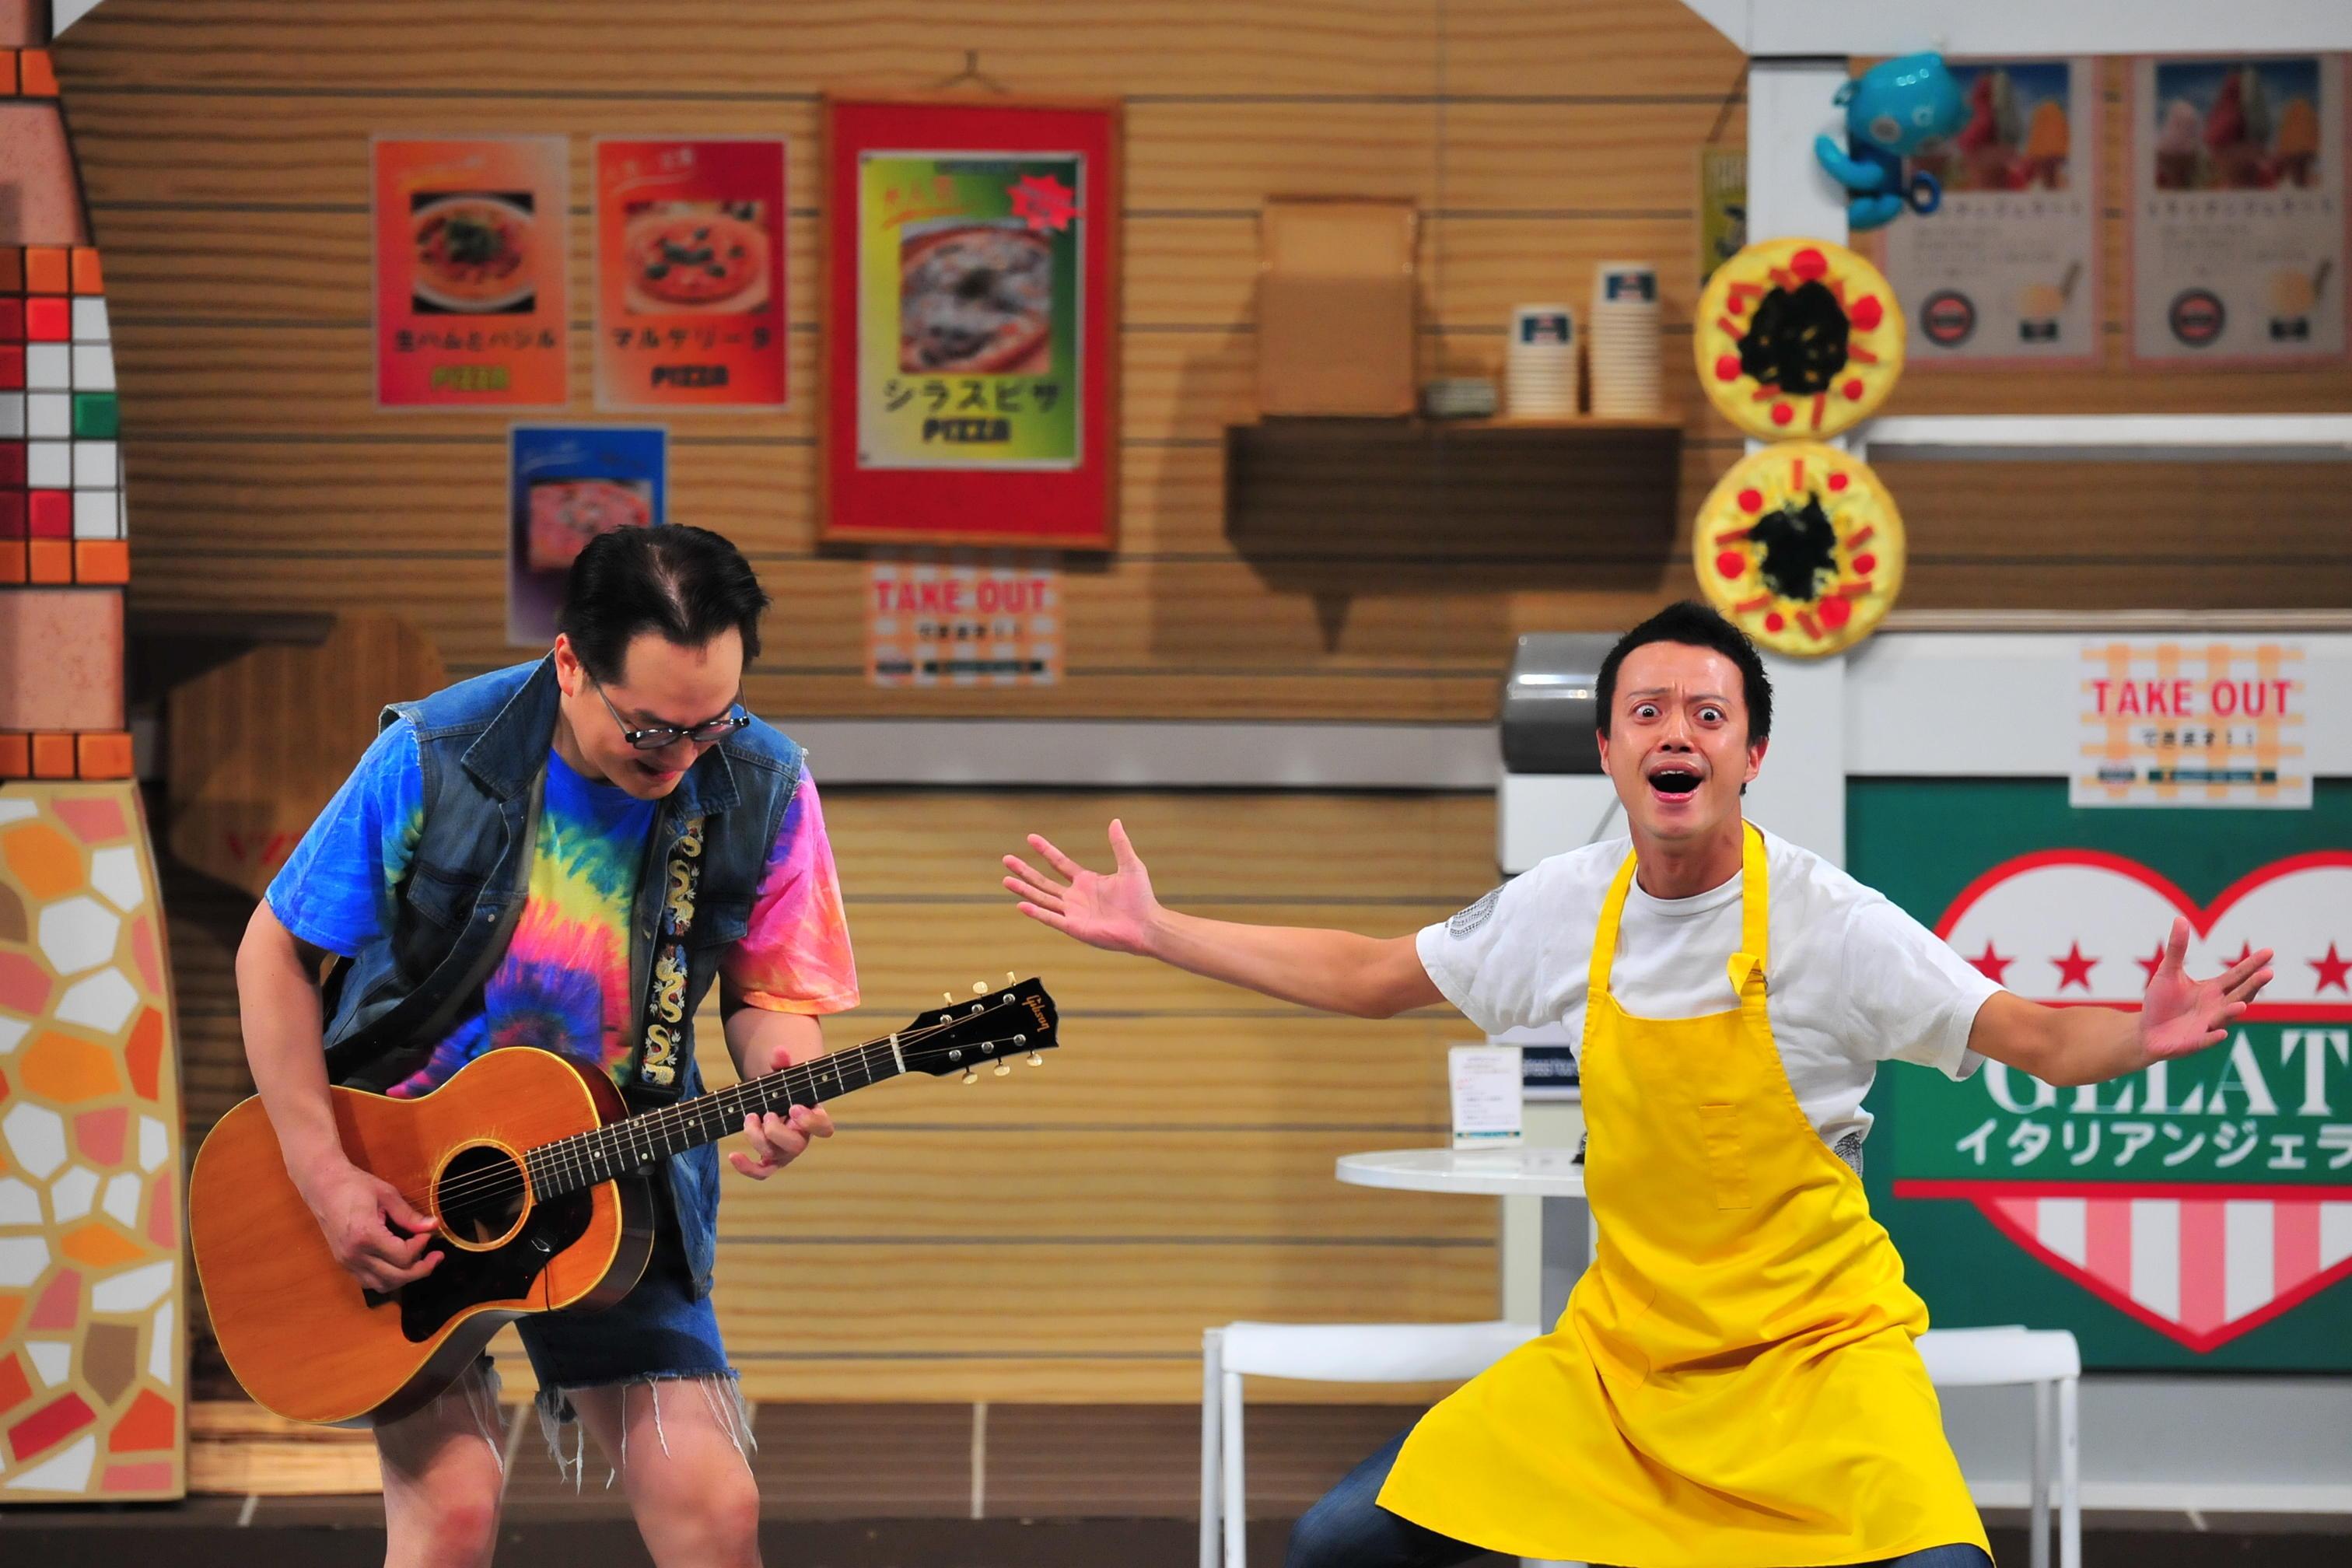 http://news.yoshimoto.co.jp/20160814183502-f9c8b5467f7411fd6386b0feaaedc3cea4adb3df.jpg